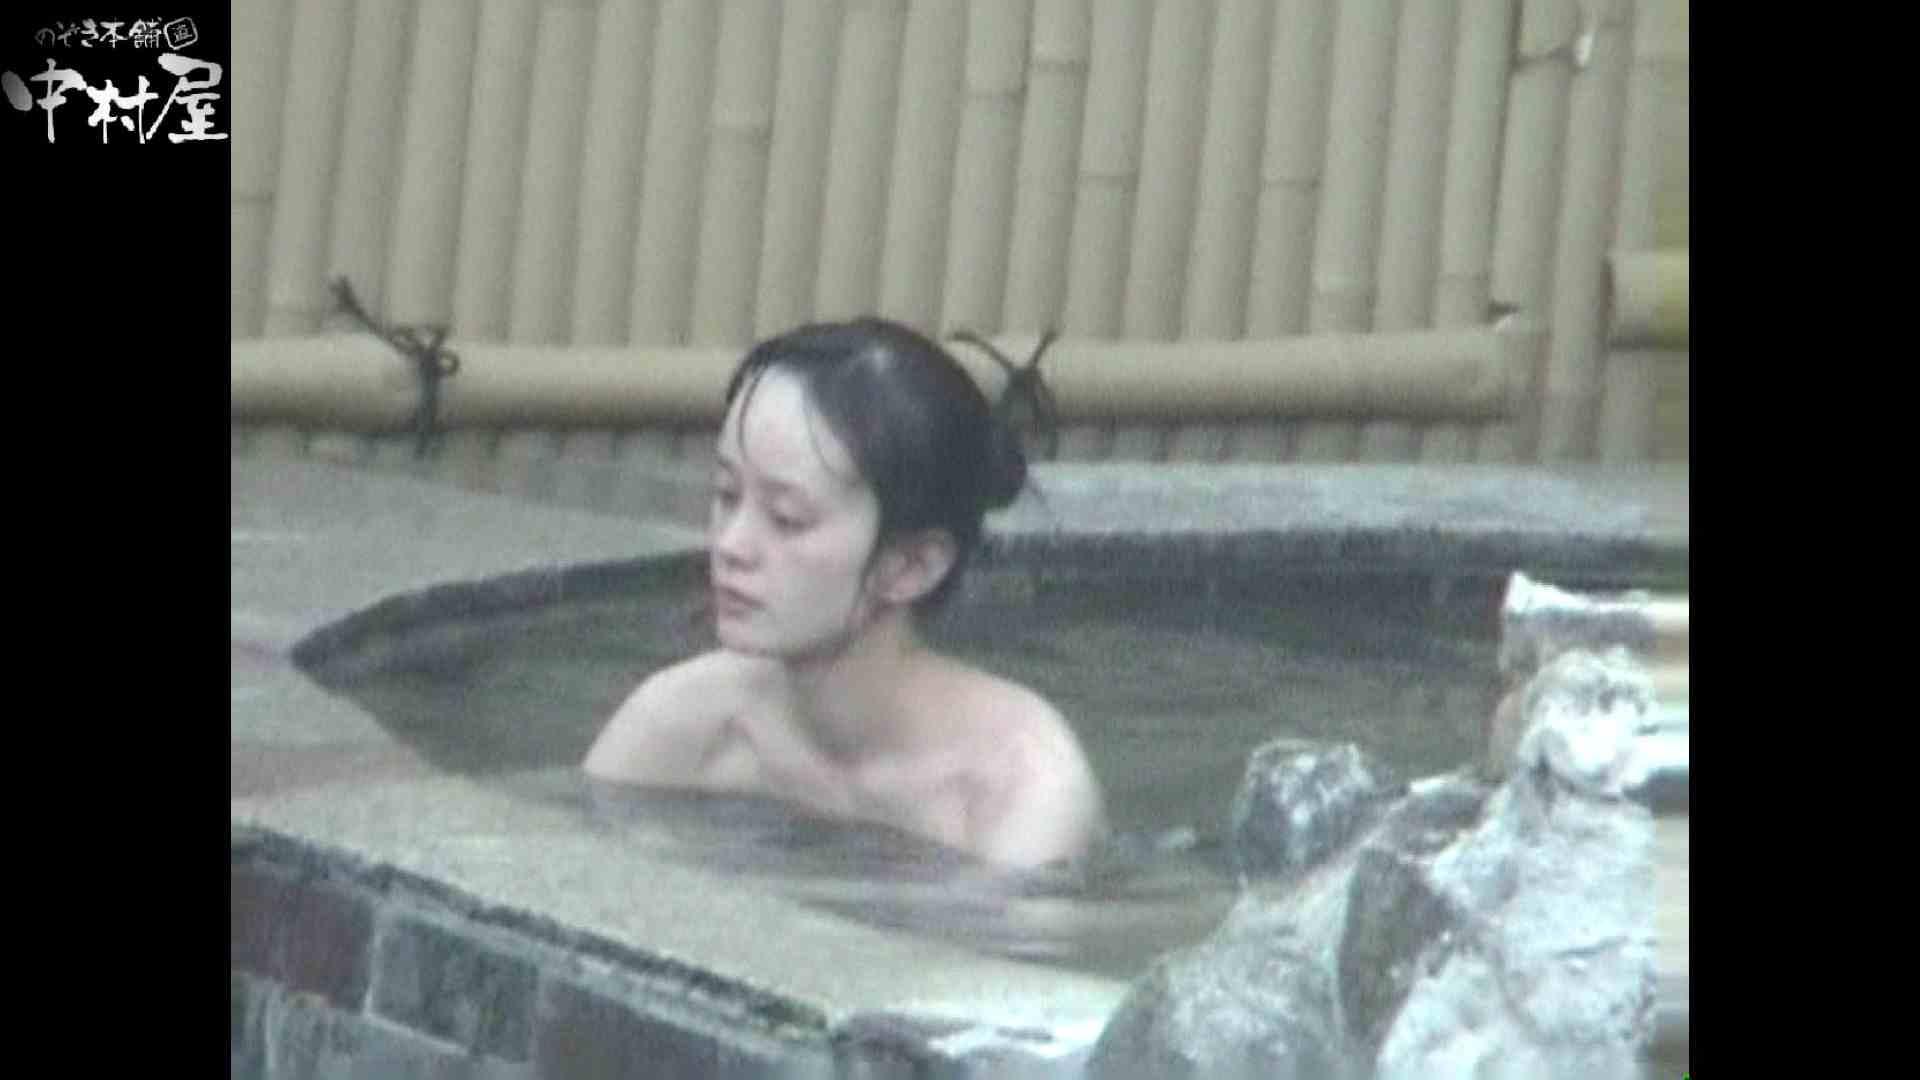 Aquaな露天風呂Vol.973 美しいOLの裸体 性交動画流出 95pic 80